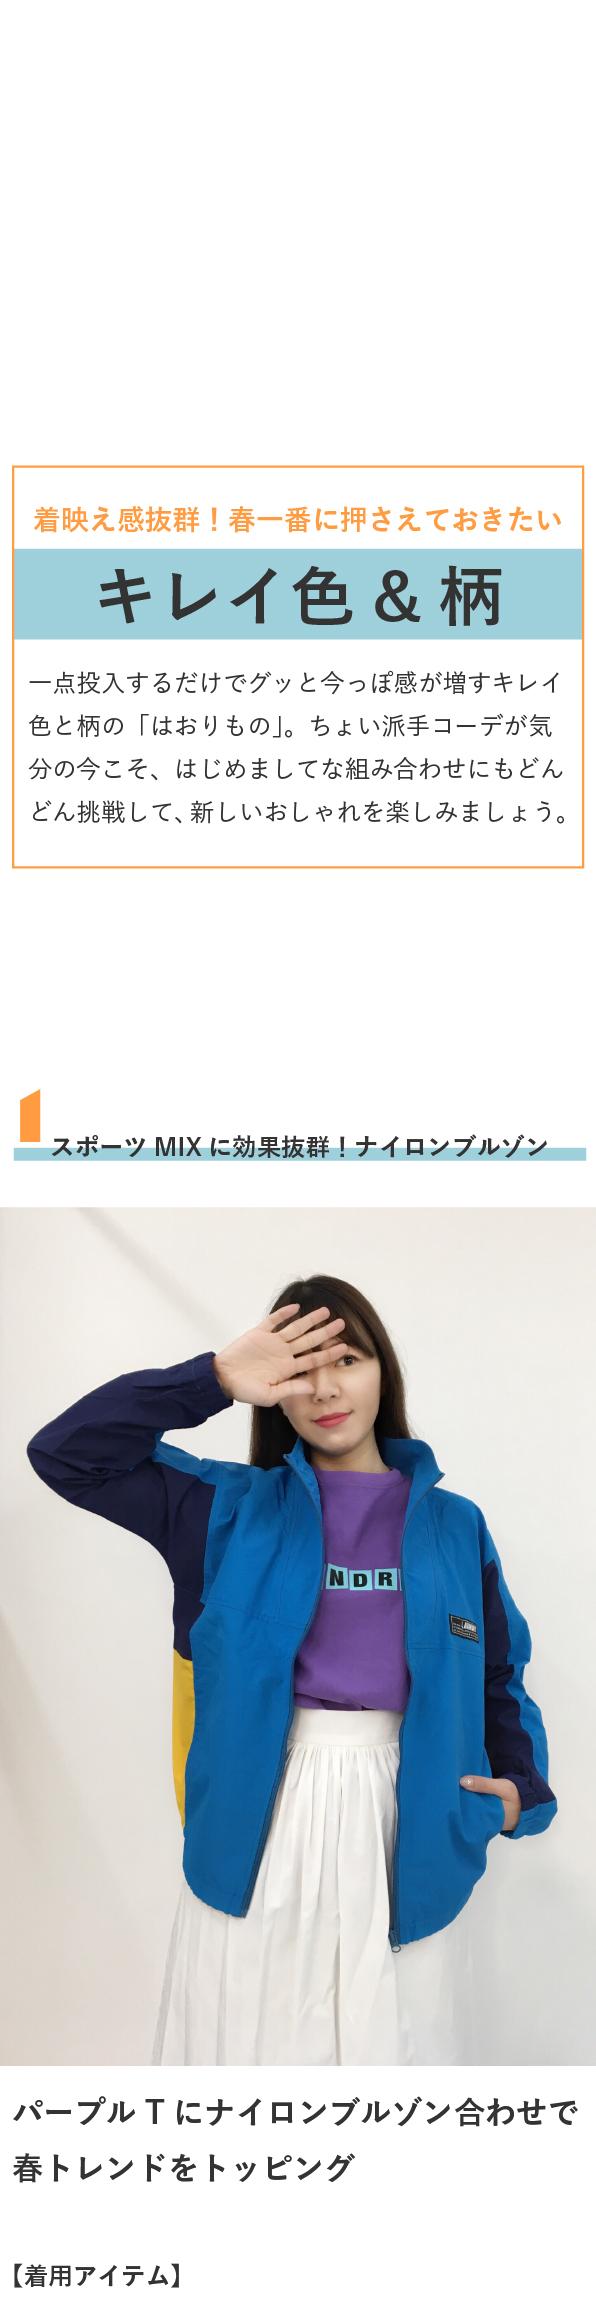 0303haori-04-596-01